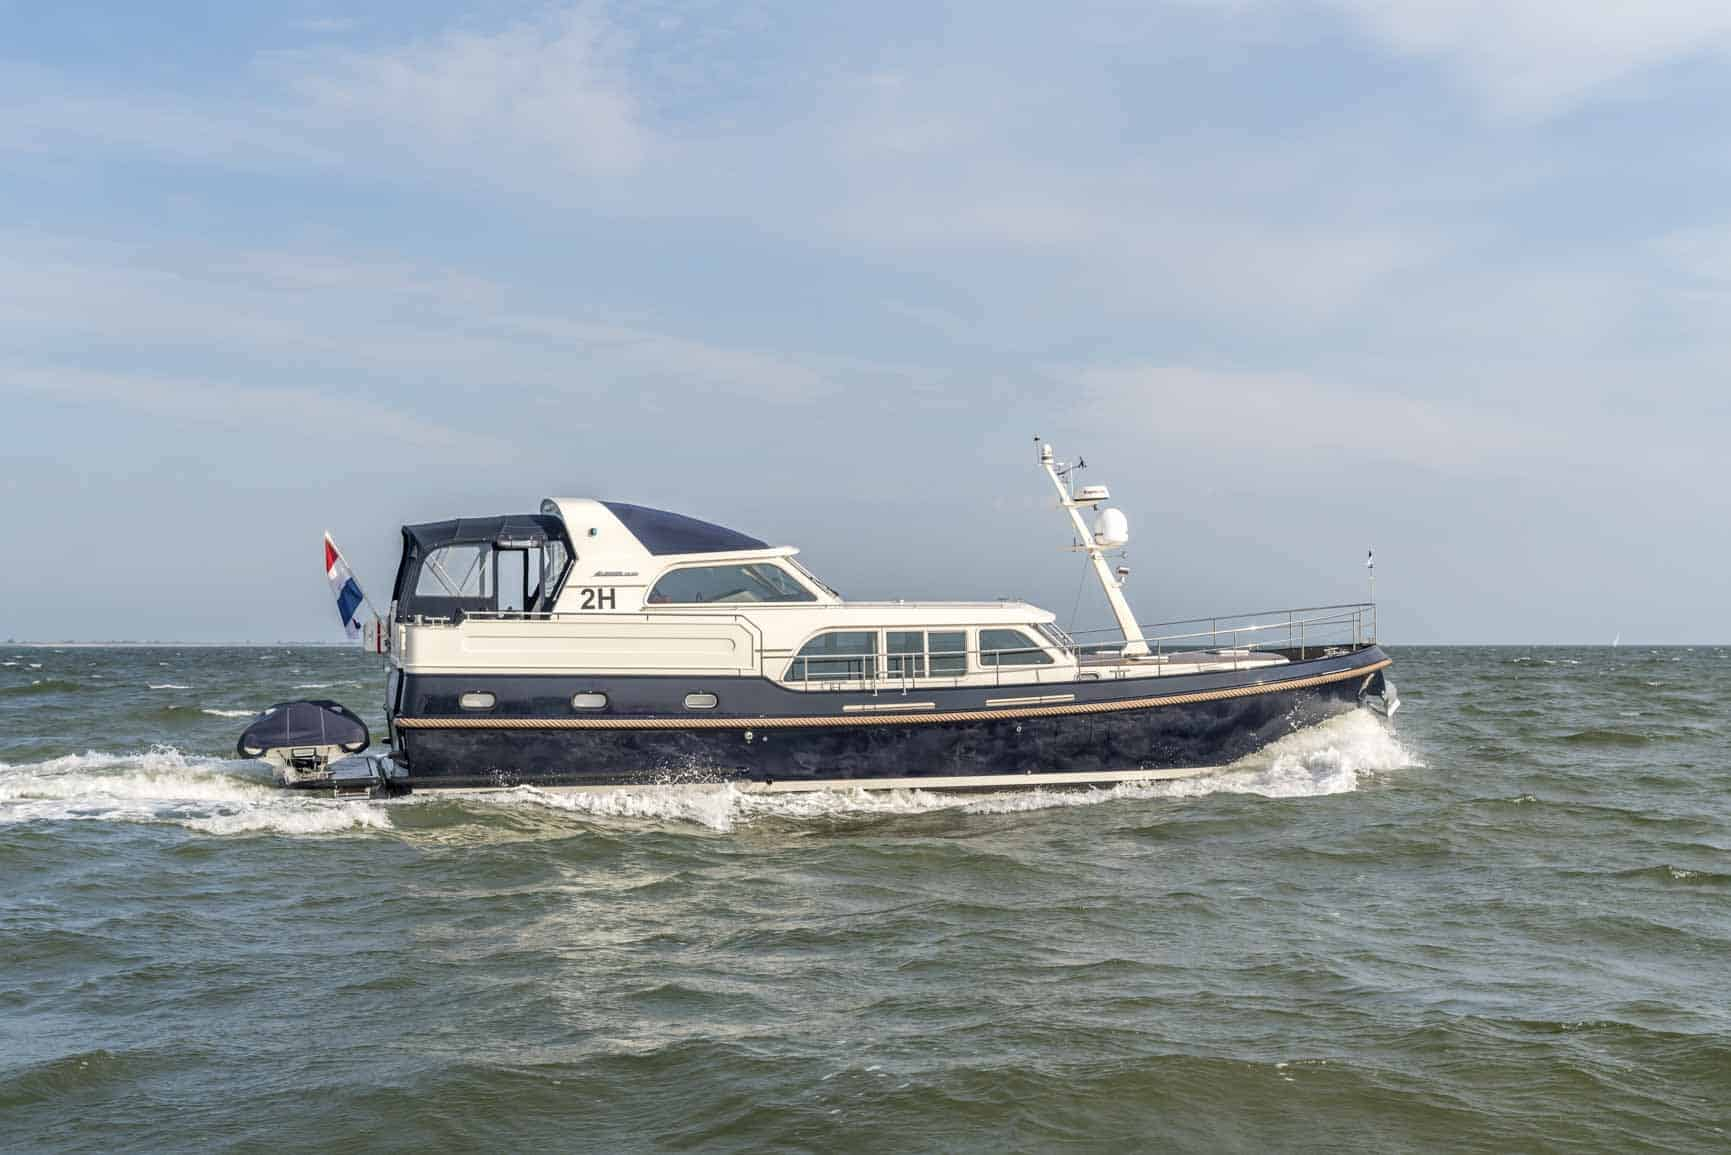 linssen-grand-sturdy-500-acvt-bnr3329-20200916-05973